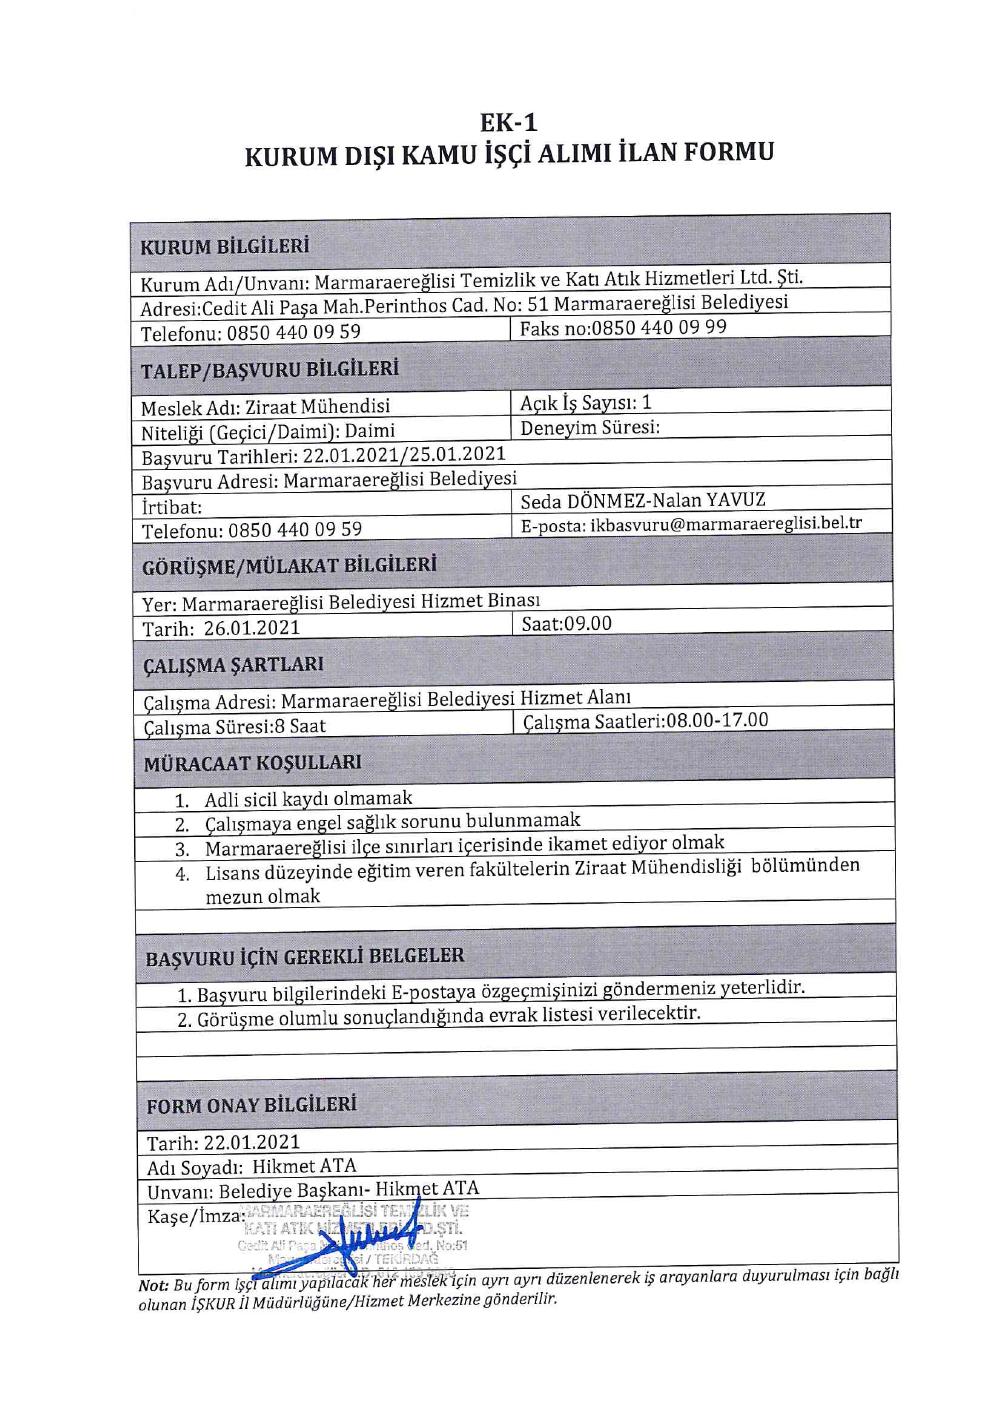 tekirdag-marmaraereglisi-temizlik-ve-kati-atik-hizmetleri-ltd-sti-25-01-2021-000004.png